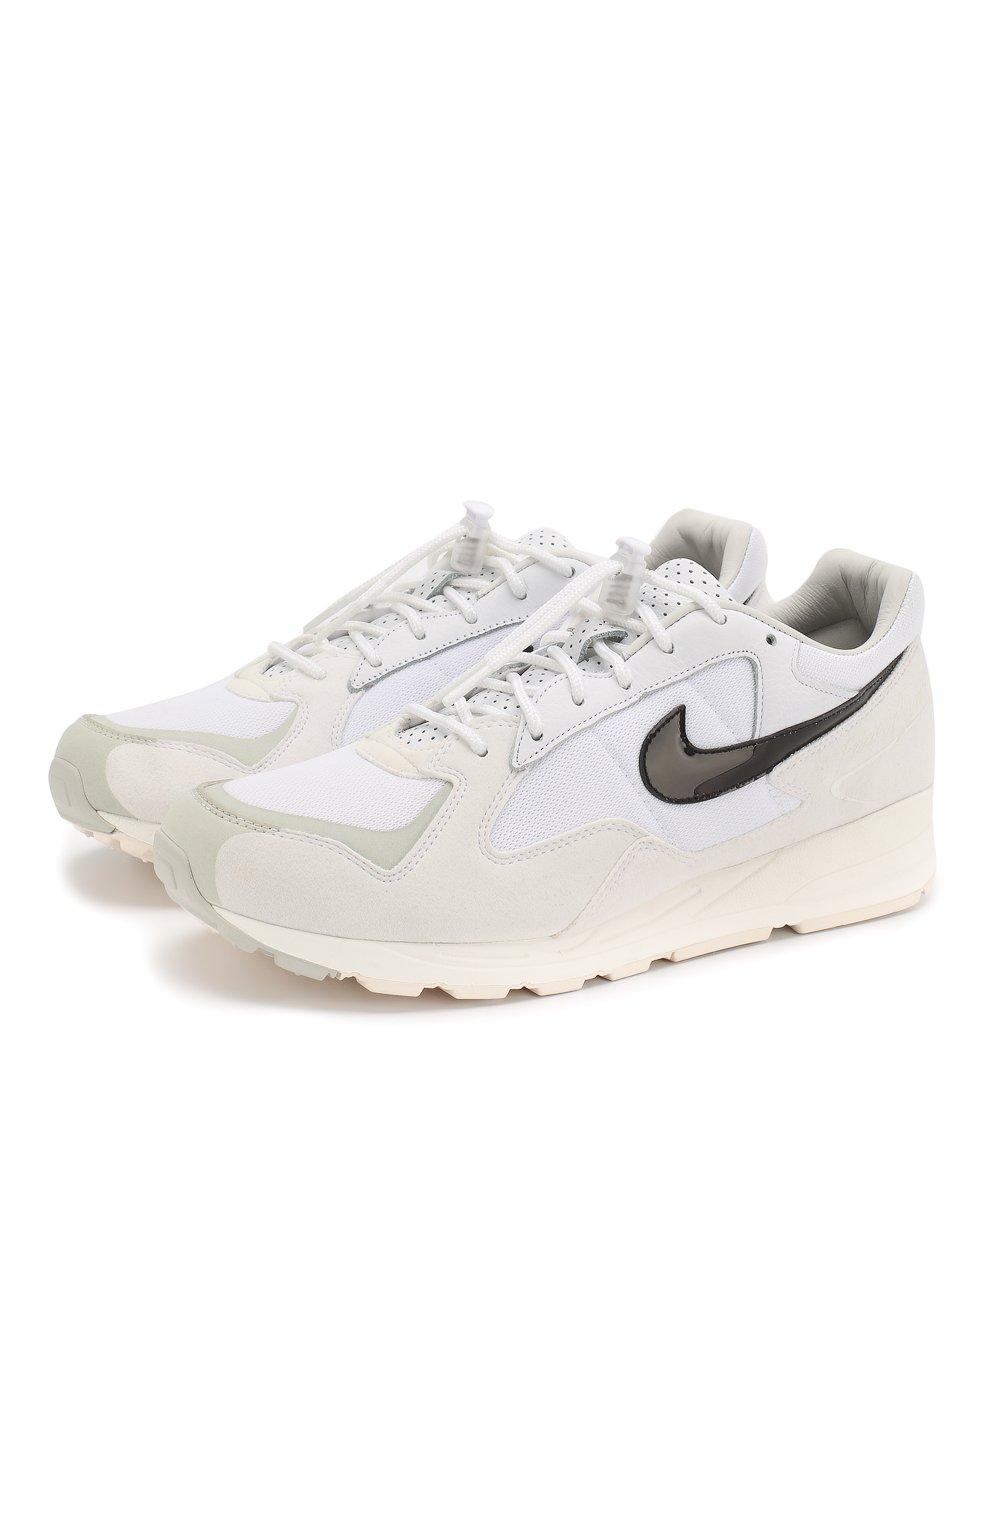 57e4bb7b Комбинированные кроссовки Nike x Fear of God Air Skylon II NikeLab белые |  Фото №1